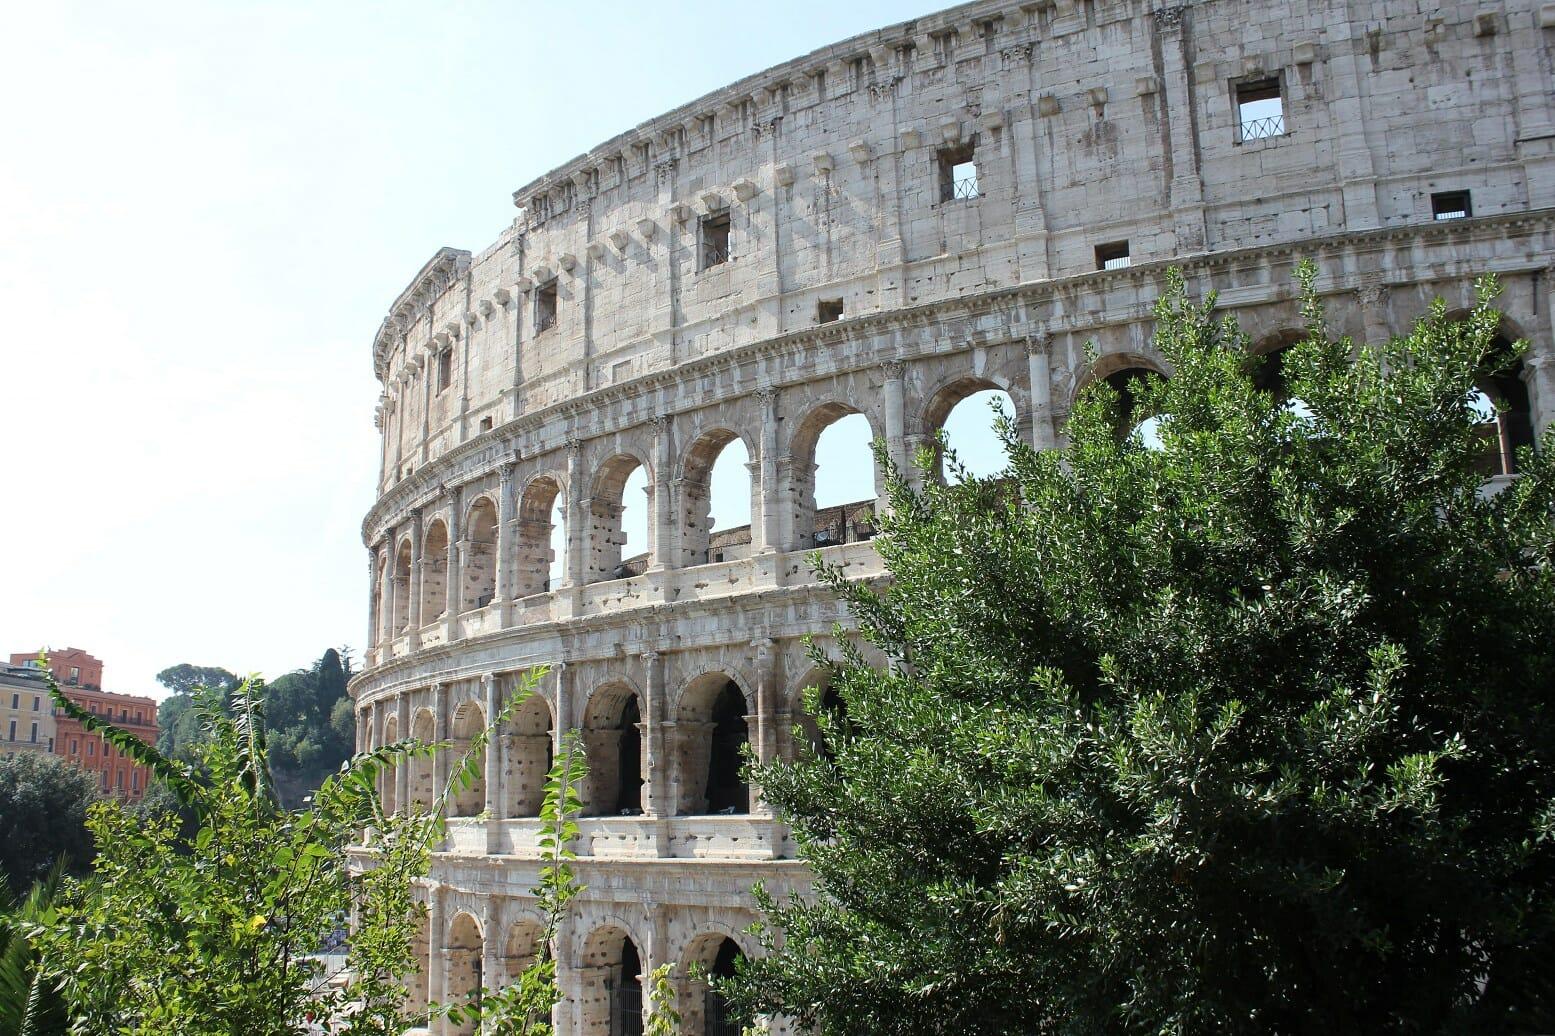 Roman Forum Colosseum